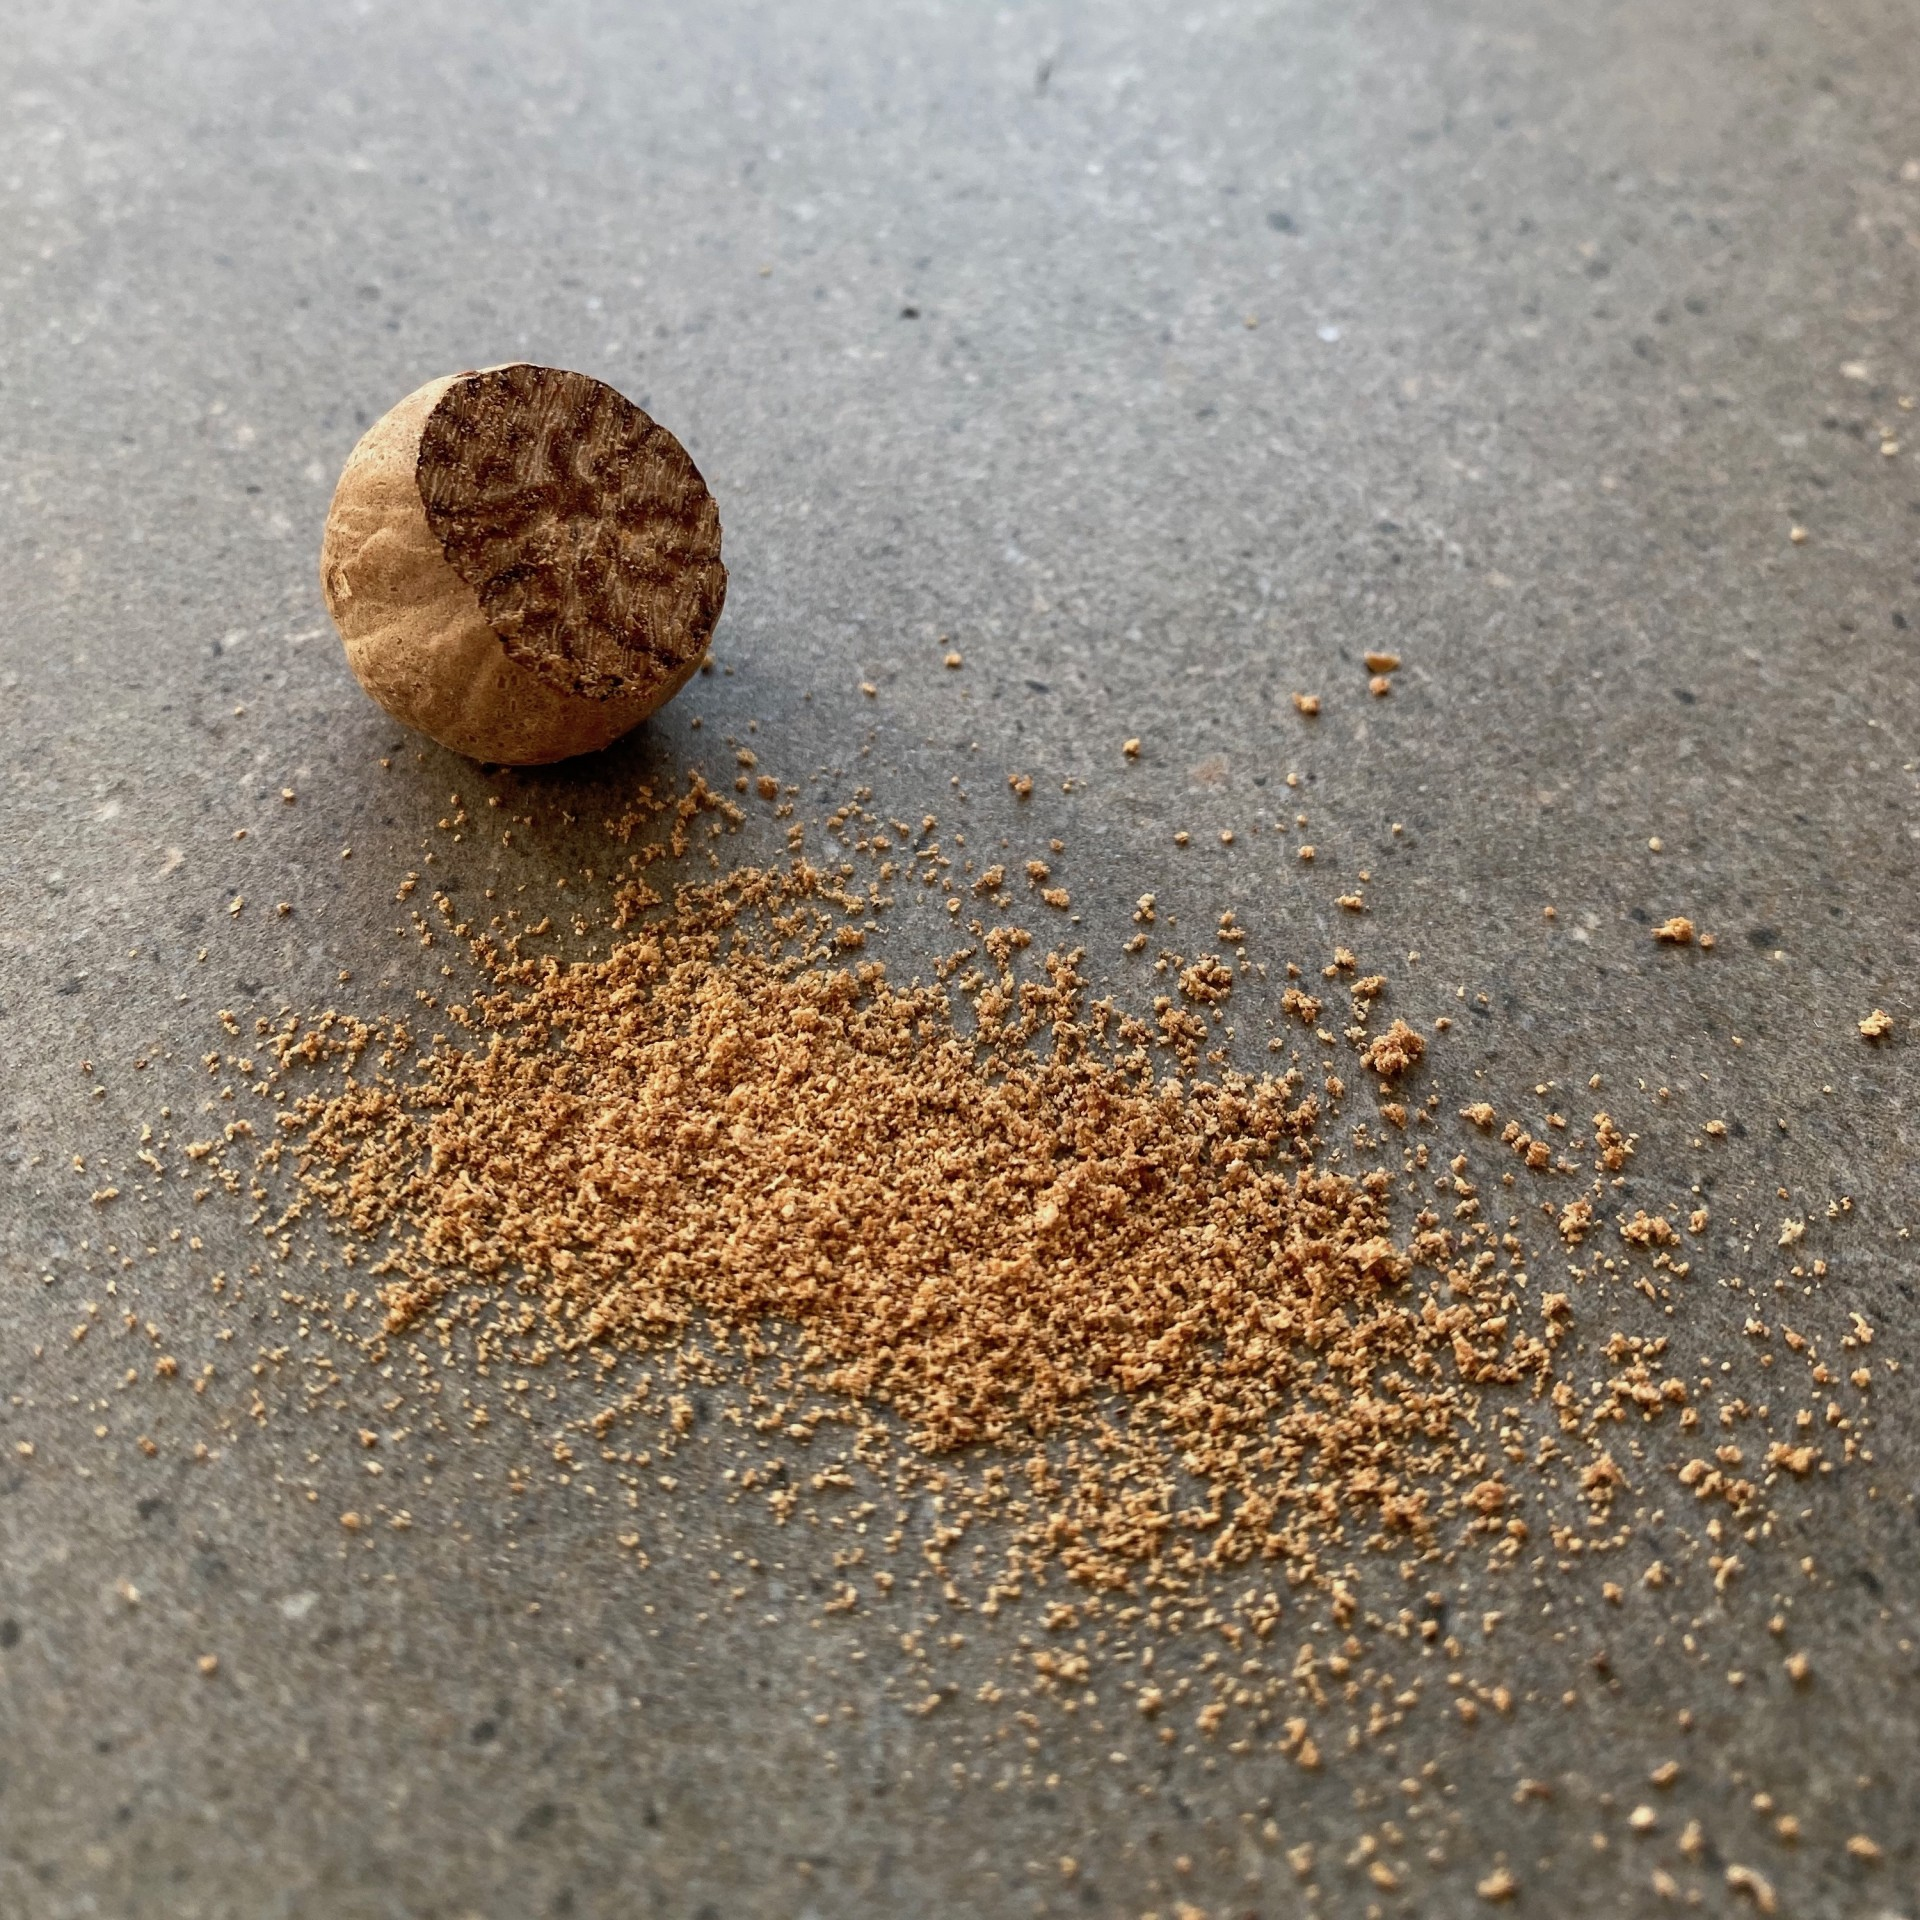 023 NUTMEG - DRIED ORGANIC NUTS